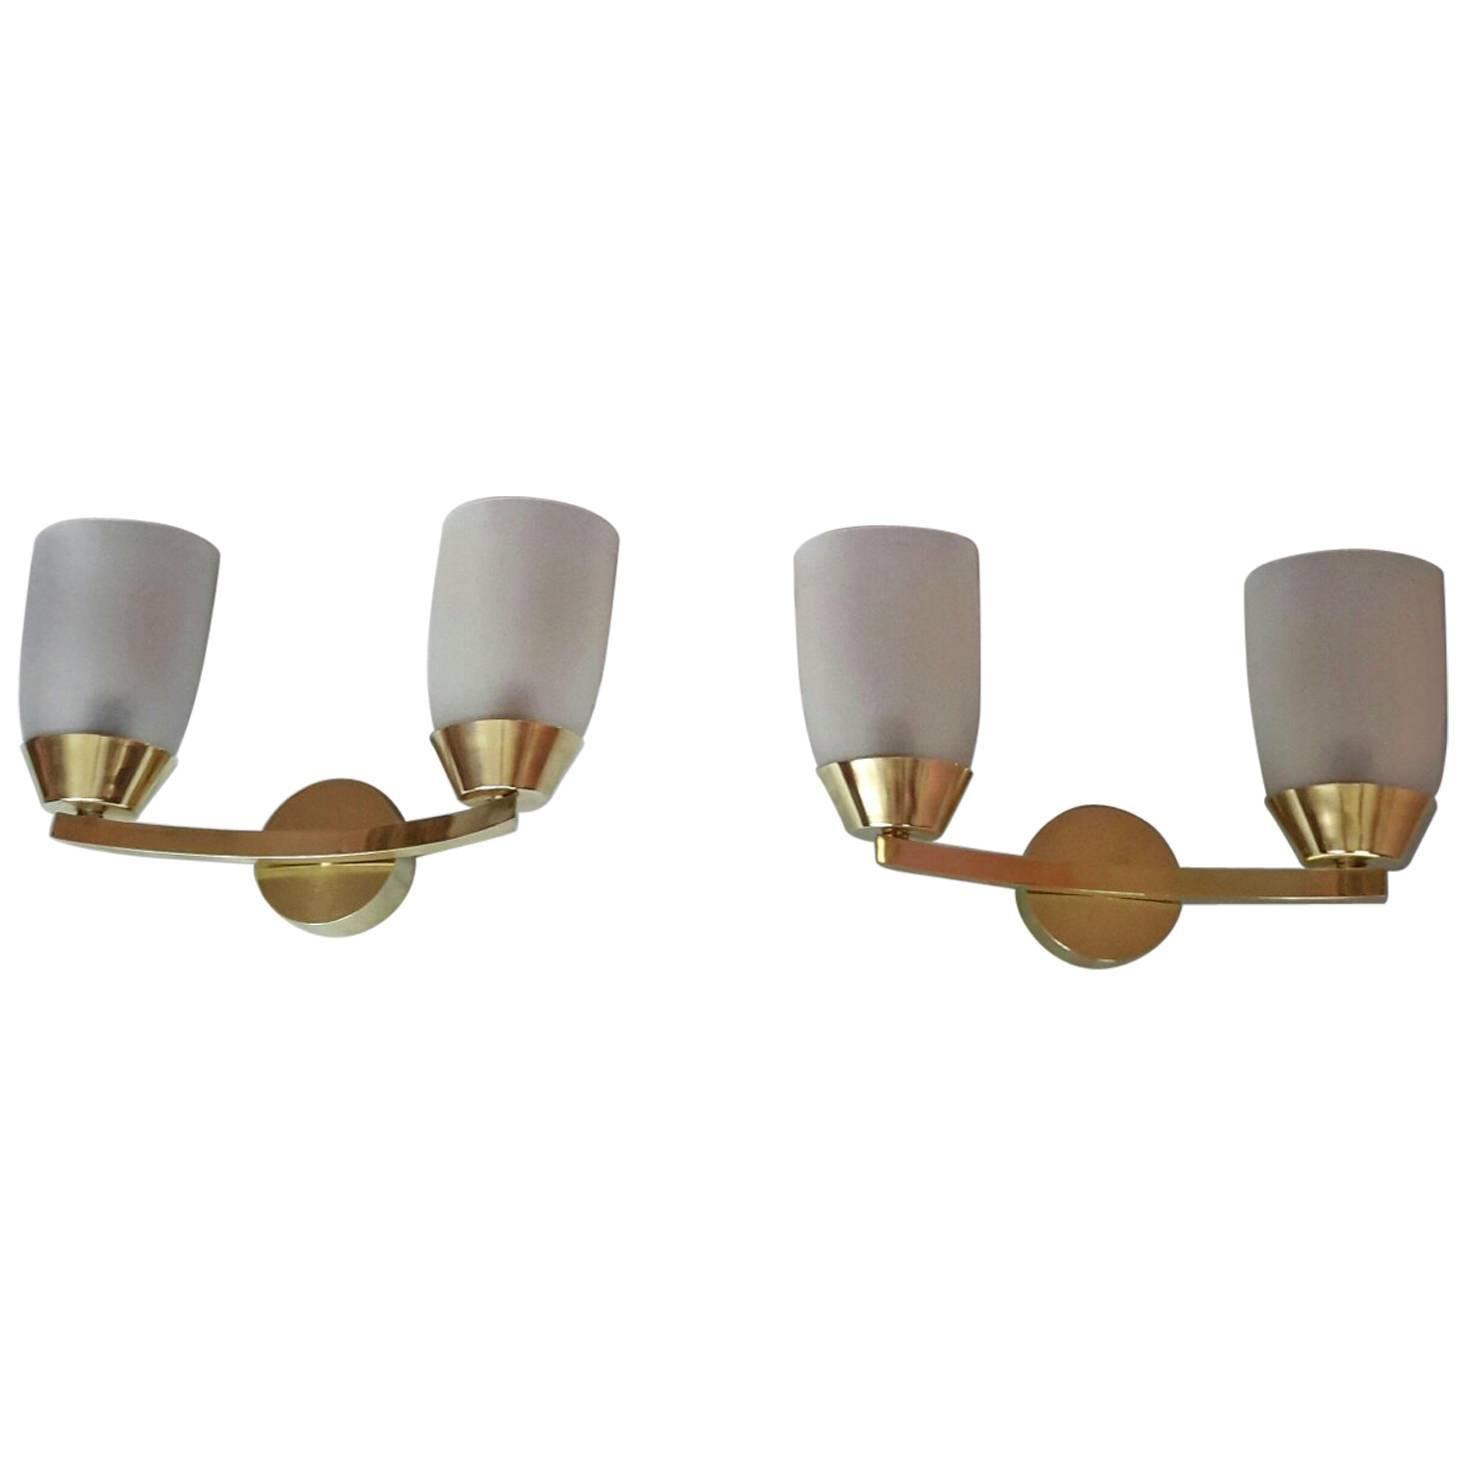 Jean Perzel Style Midcentury Brass Sconces, France, 1950s